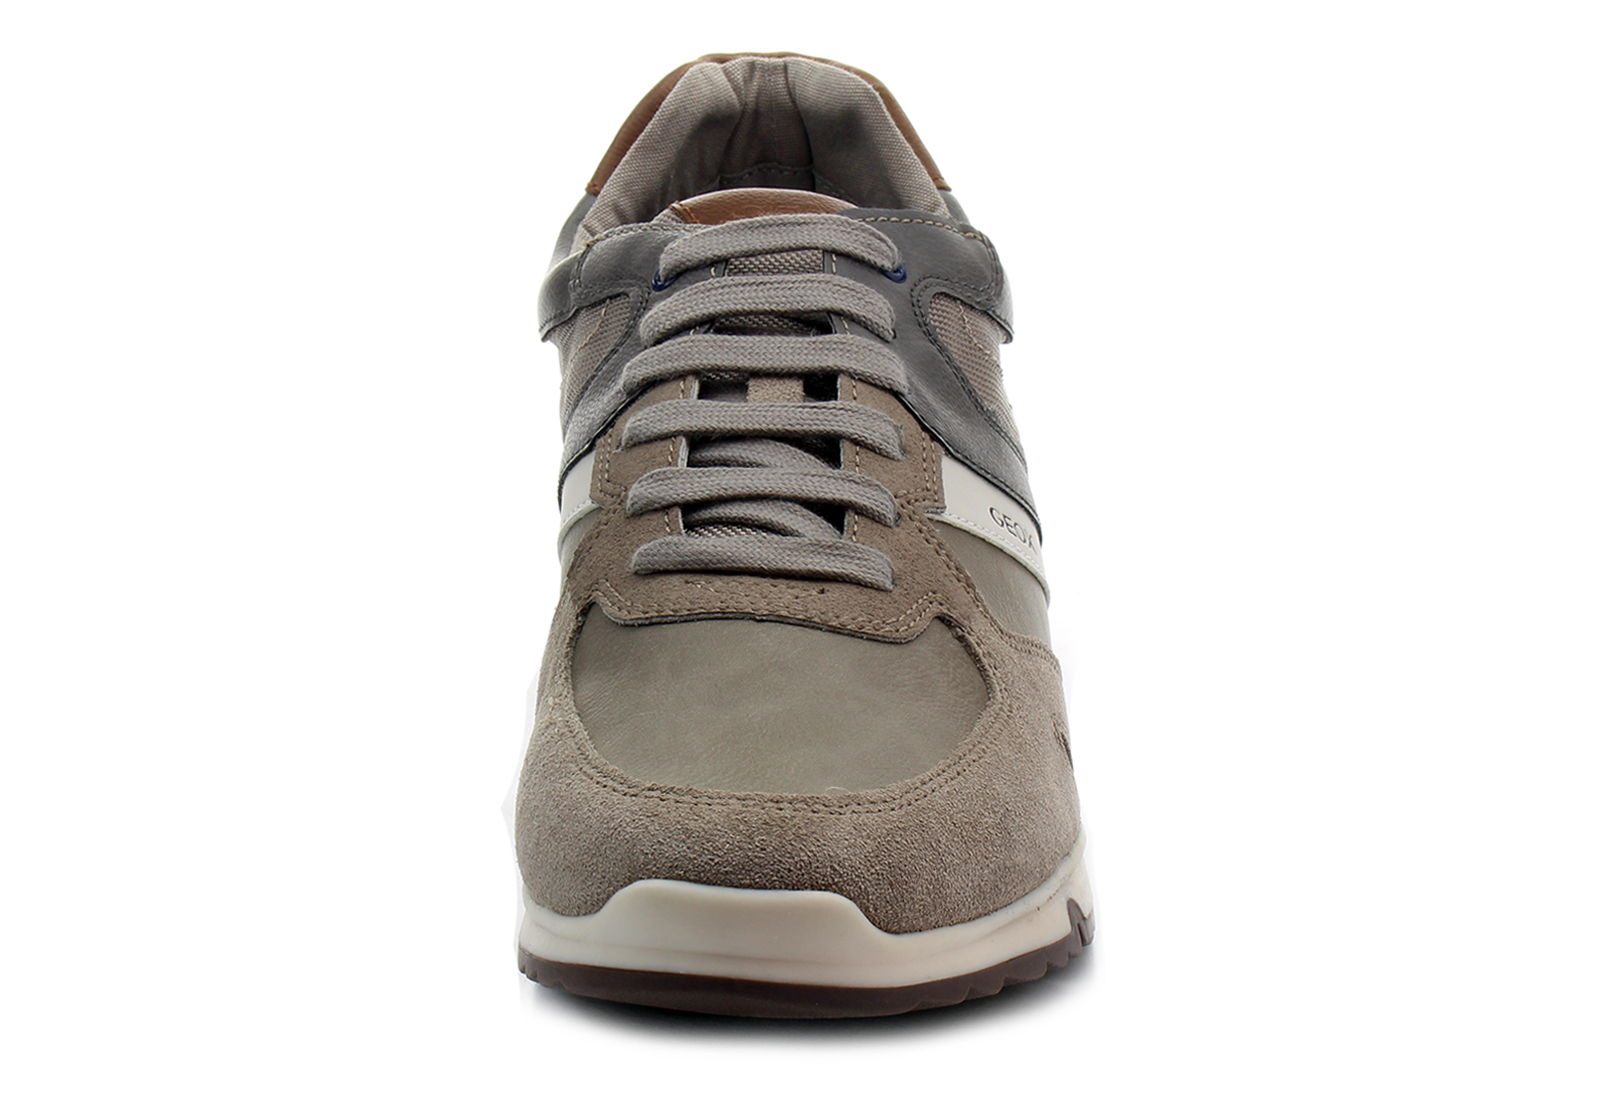 Geox Cipő - Wilmer - 3XB-ME22-5097 - Office Shoes Magyarország 391150b56e